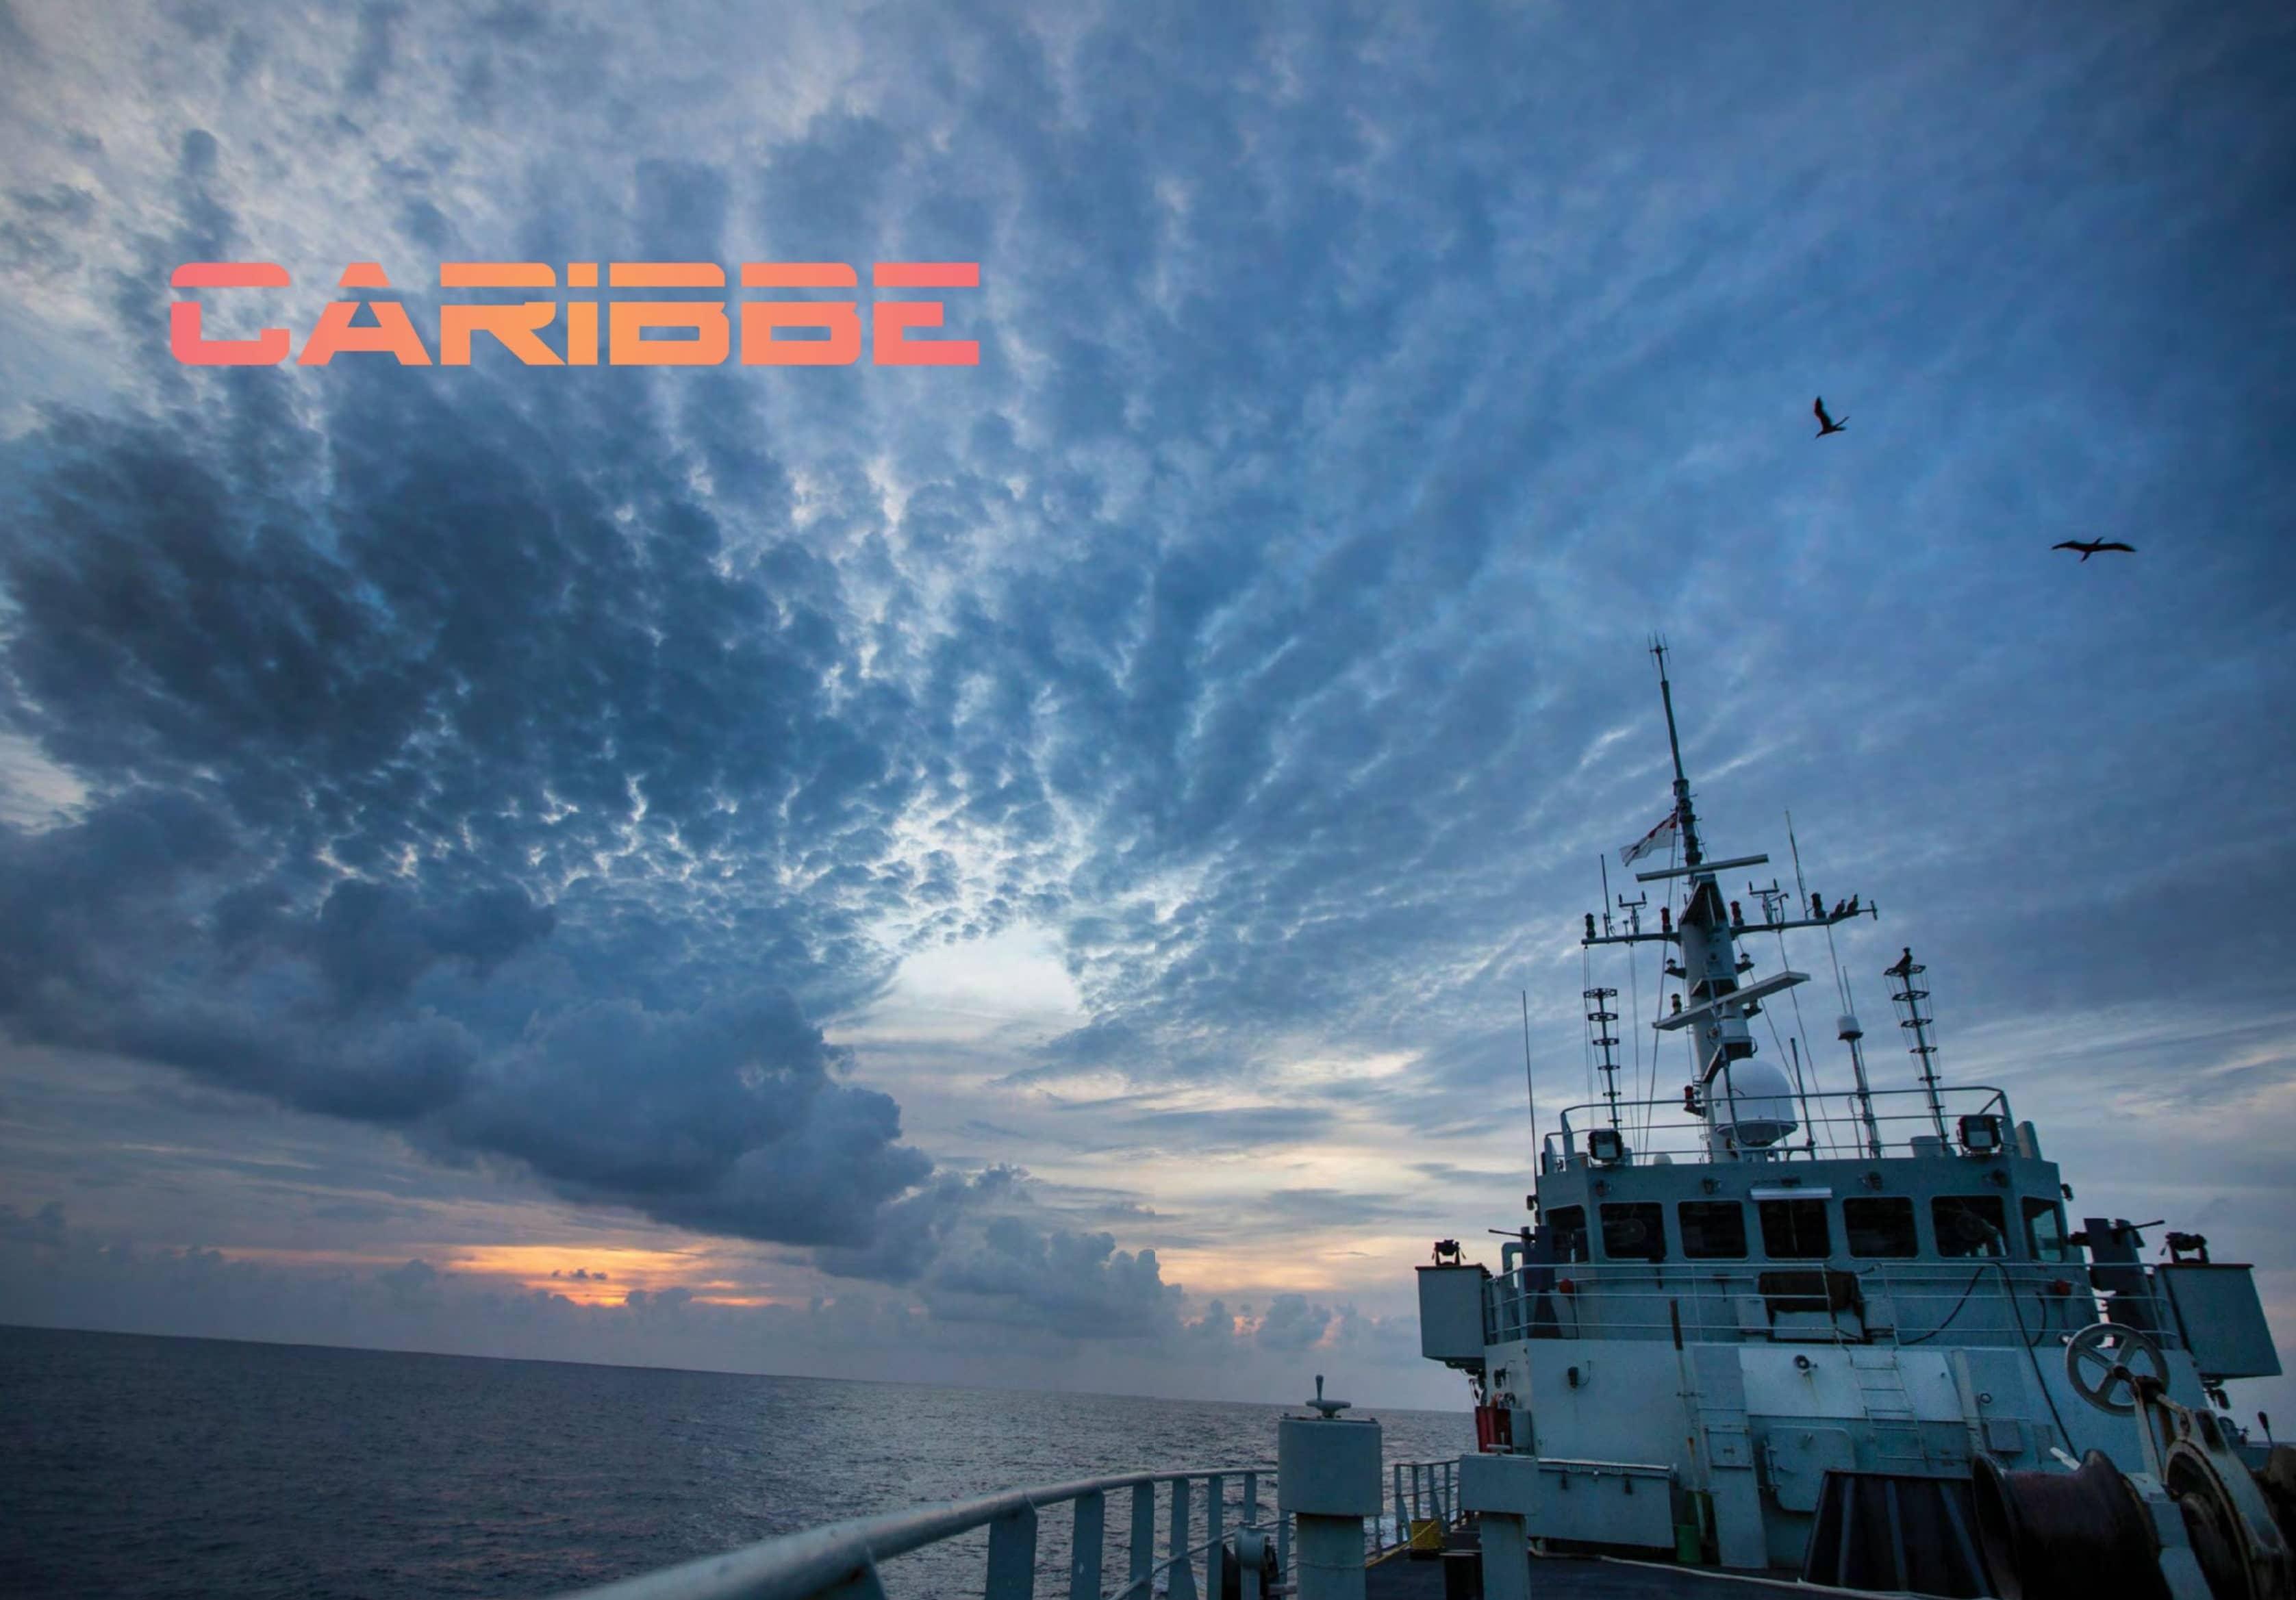 Operation Caribbe